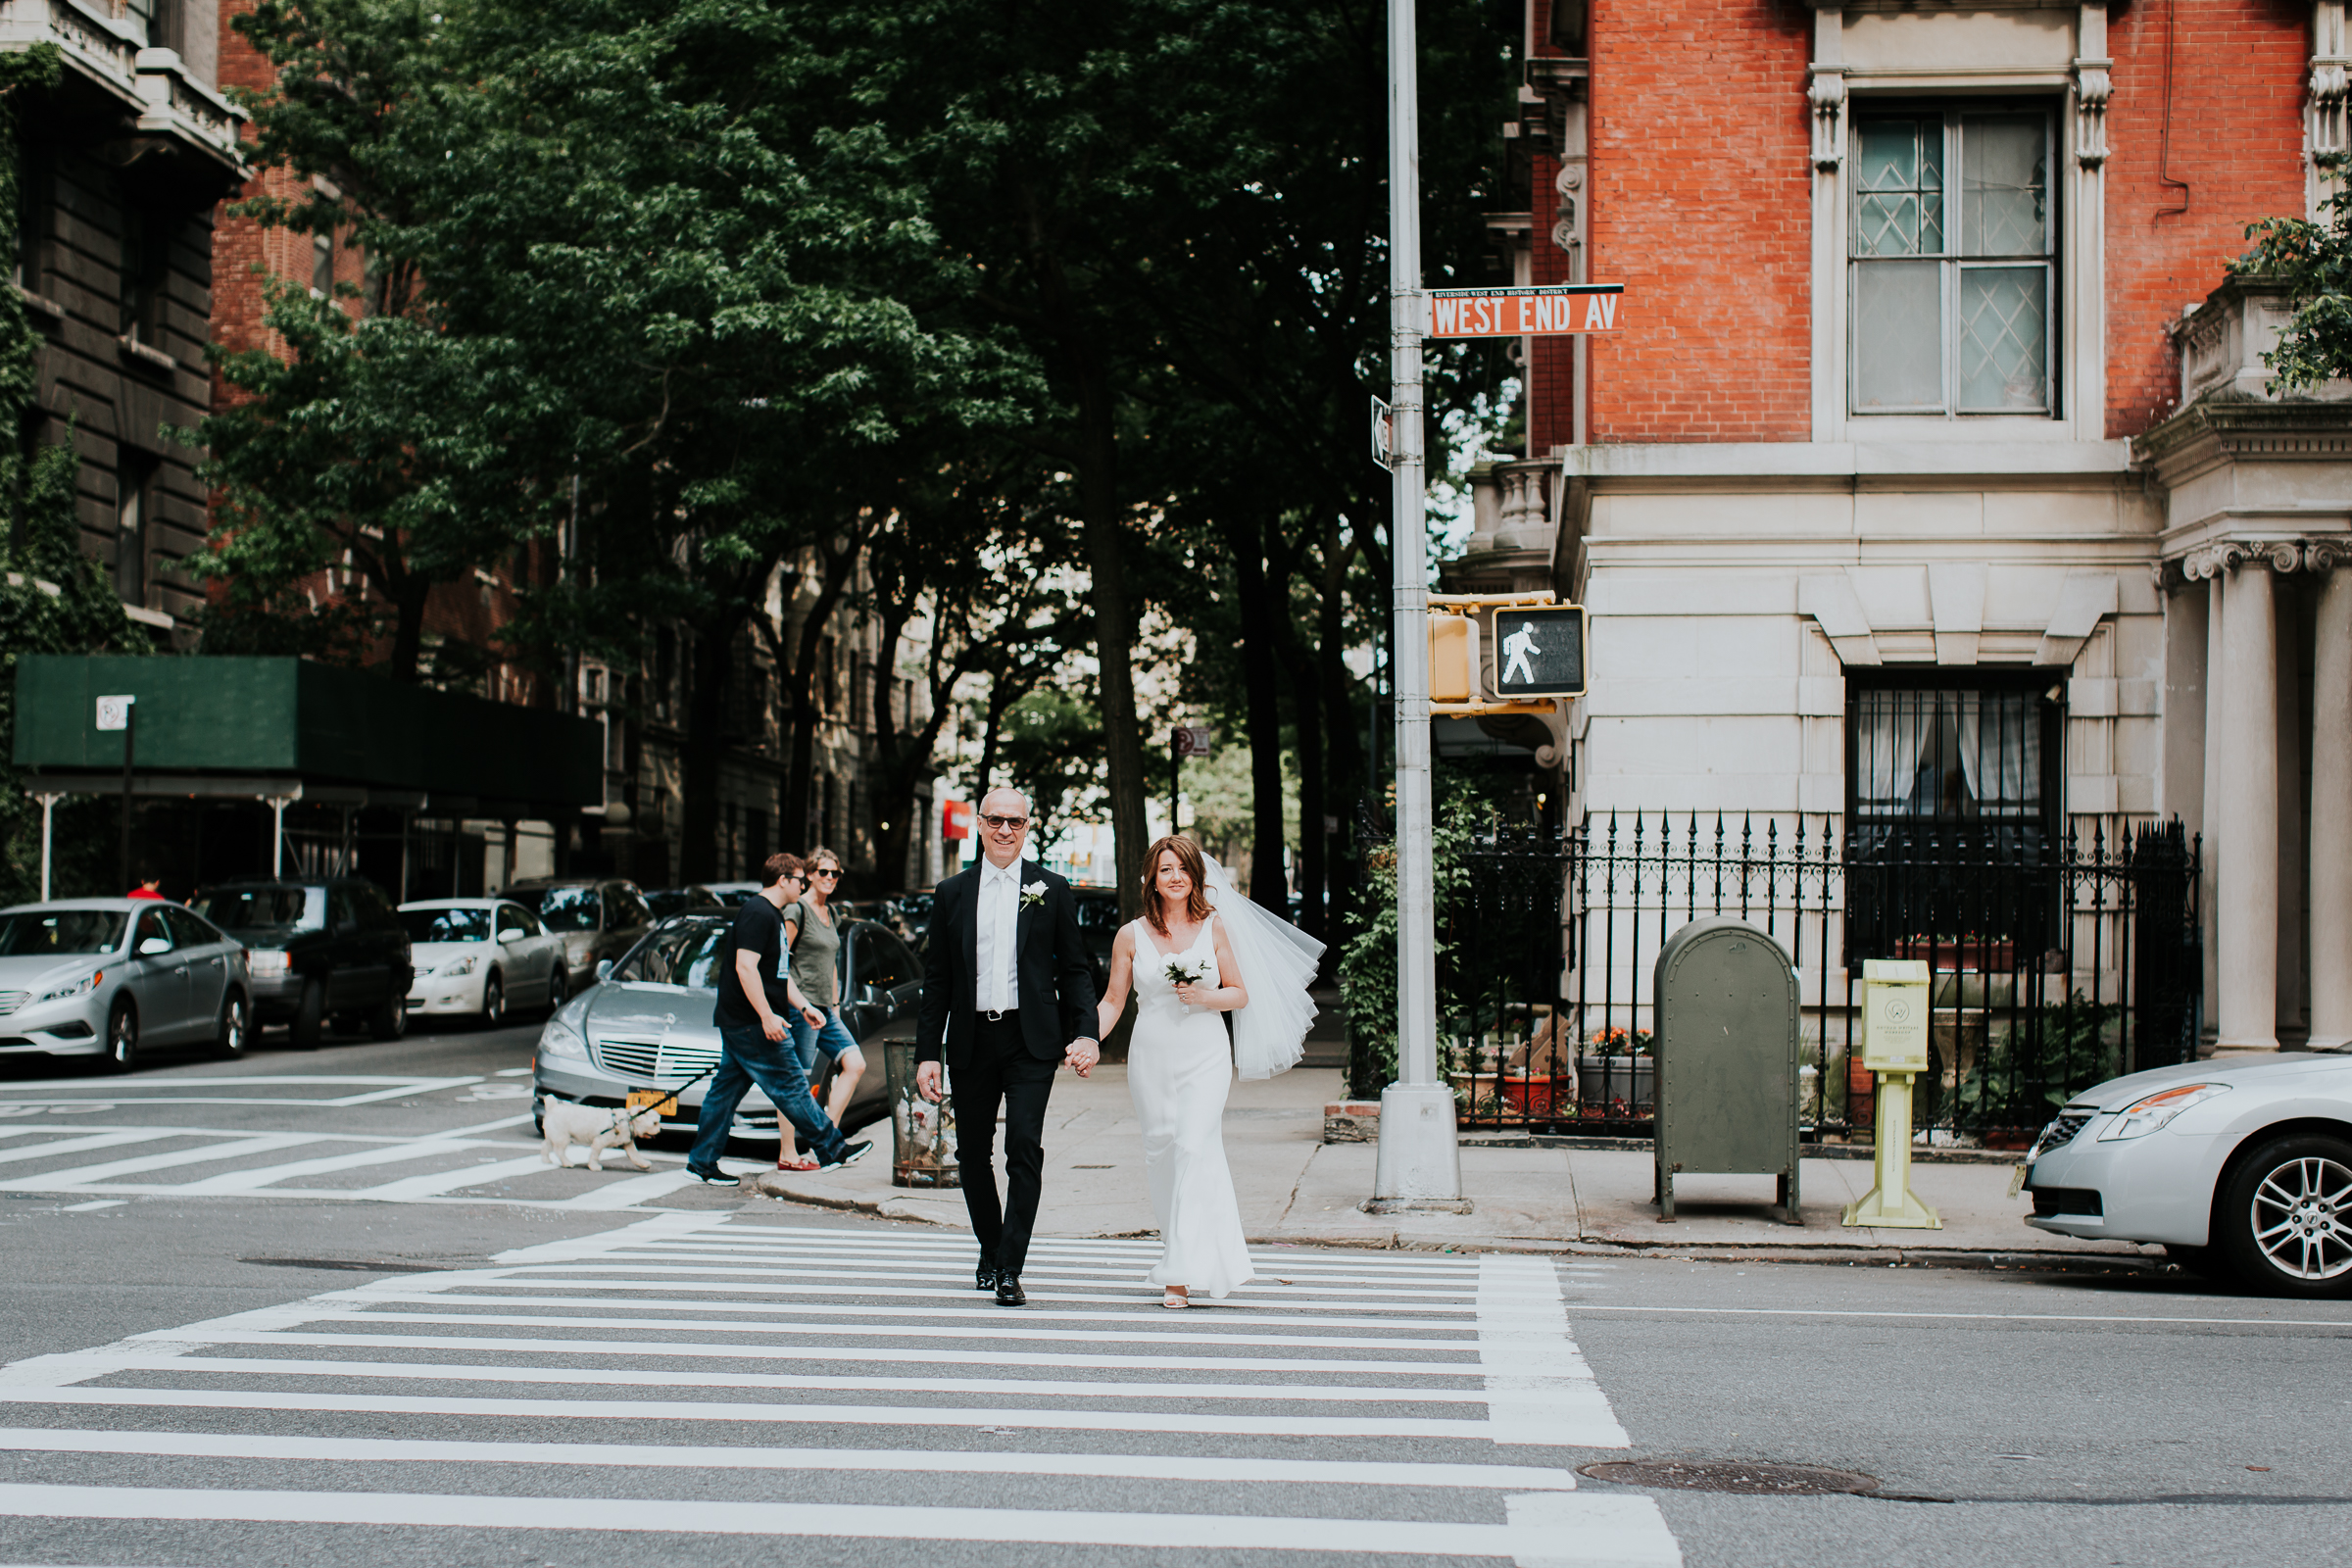 Robert-NYC-Museum-Of-Arts-&-Design-Greek-Italian-New-York-Documentary-Wedding-Photographer-29.jpg